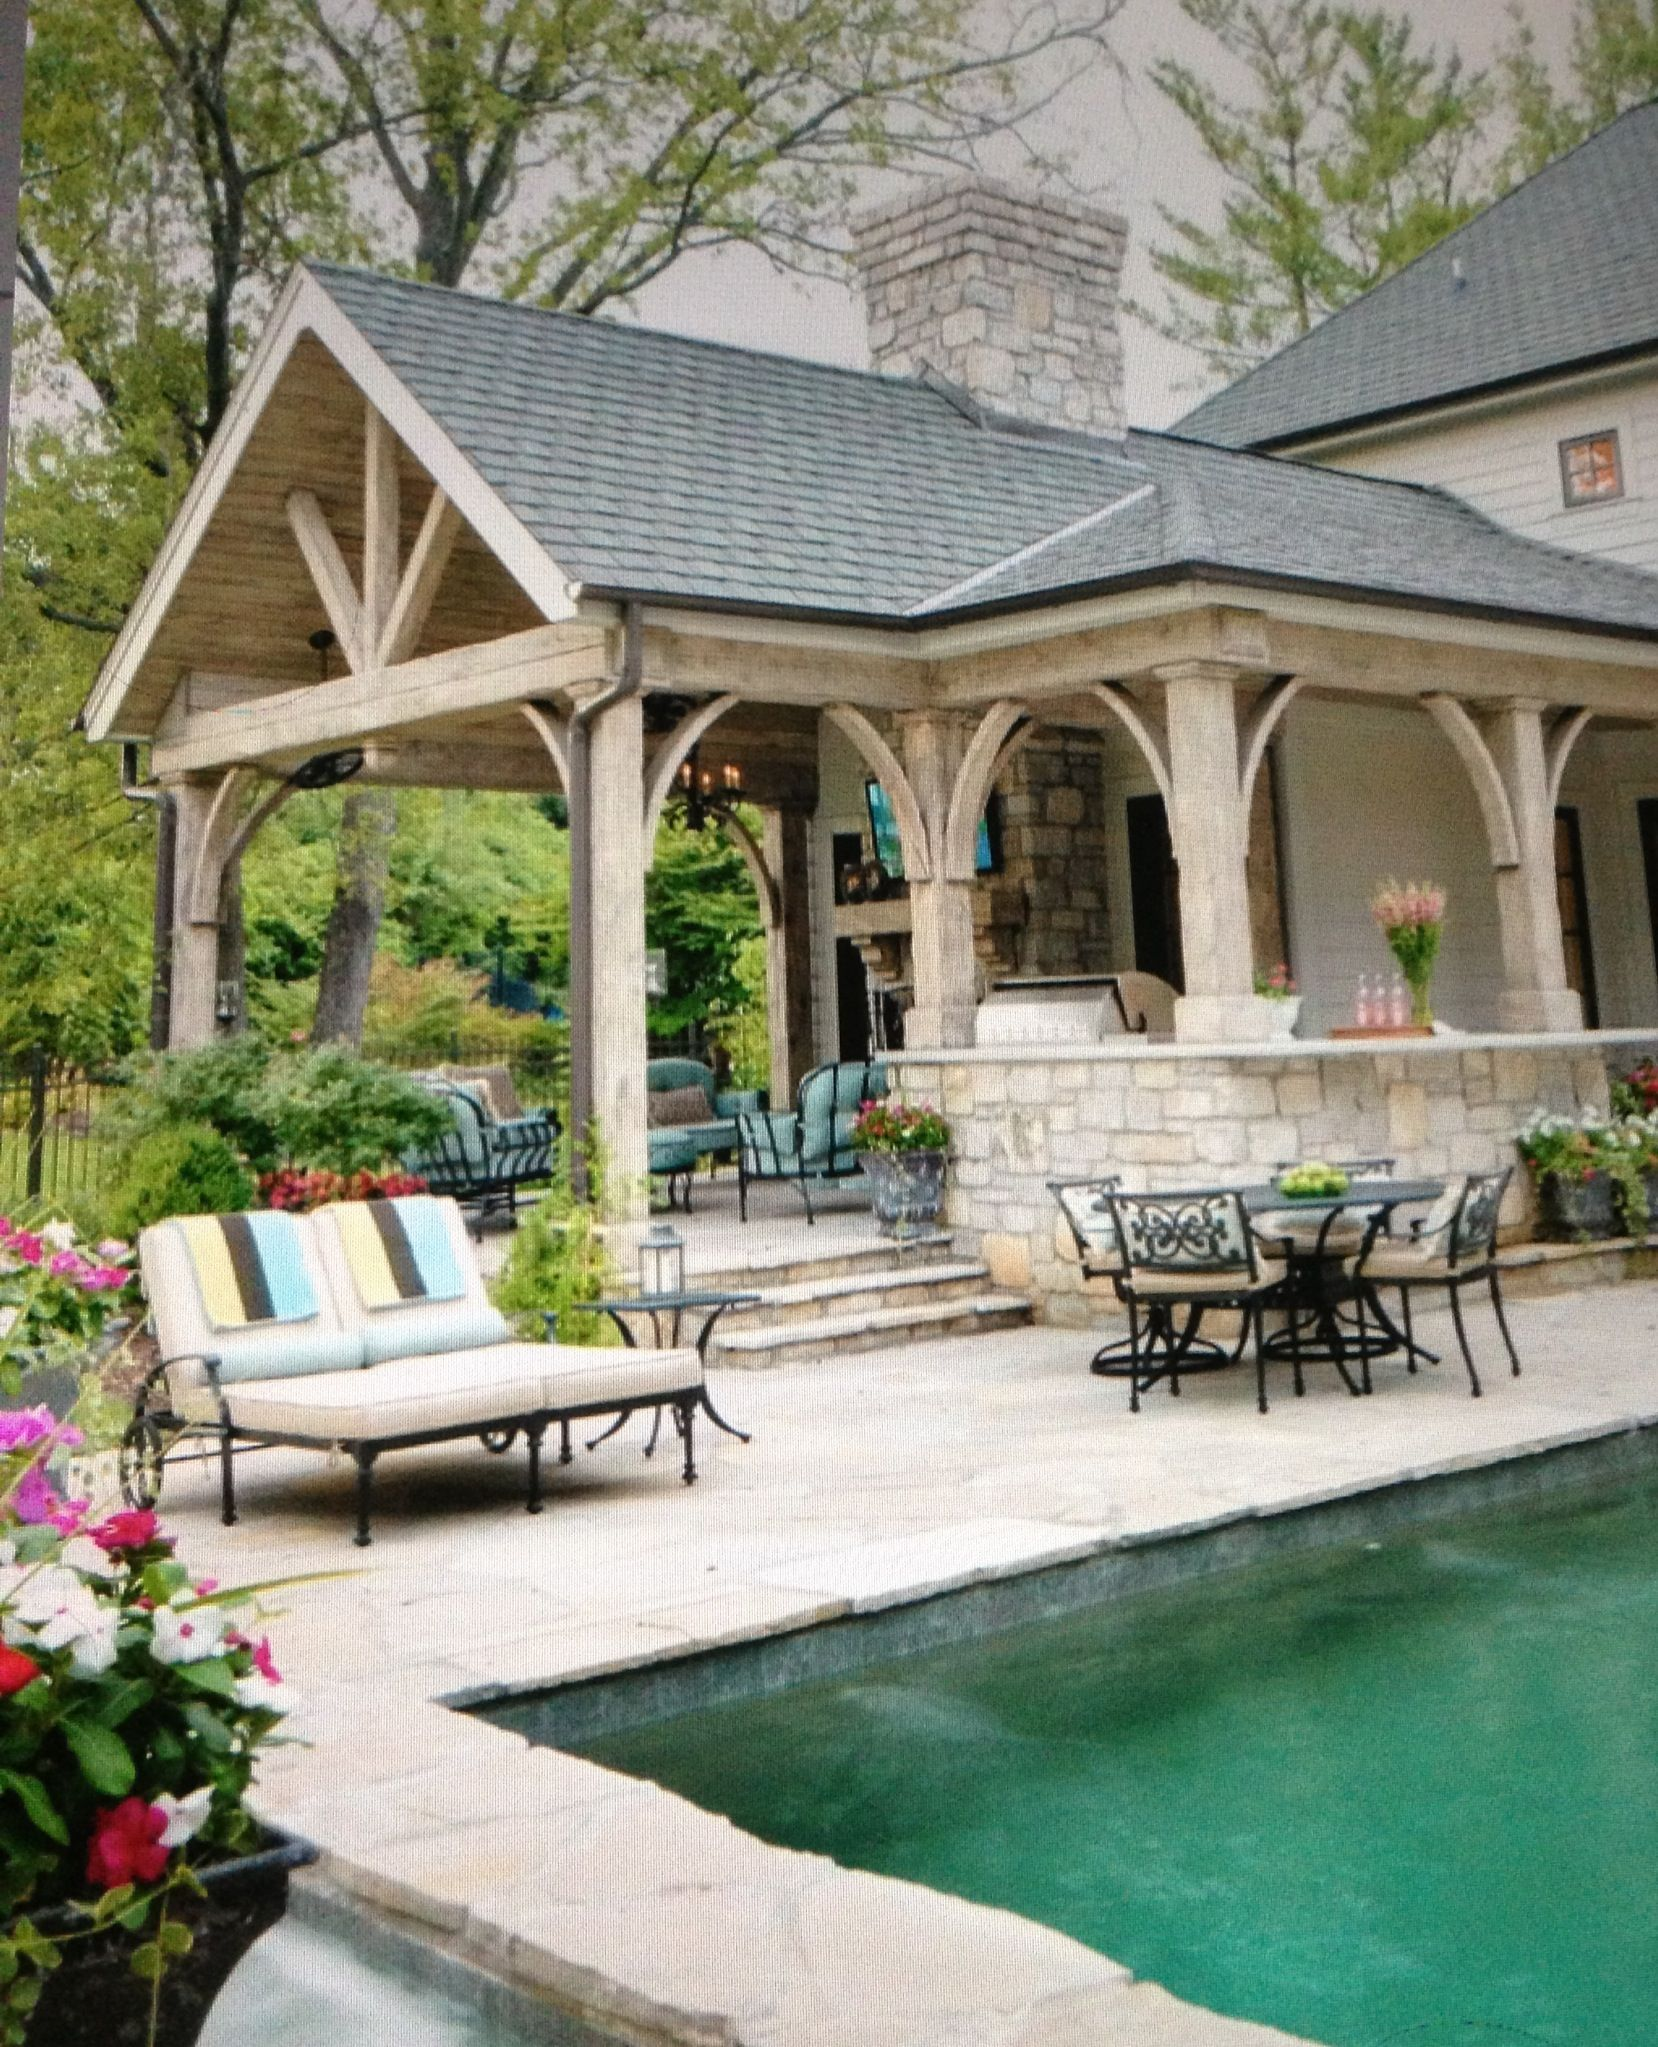 Outstanding entertaining patio